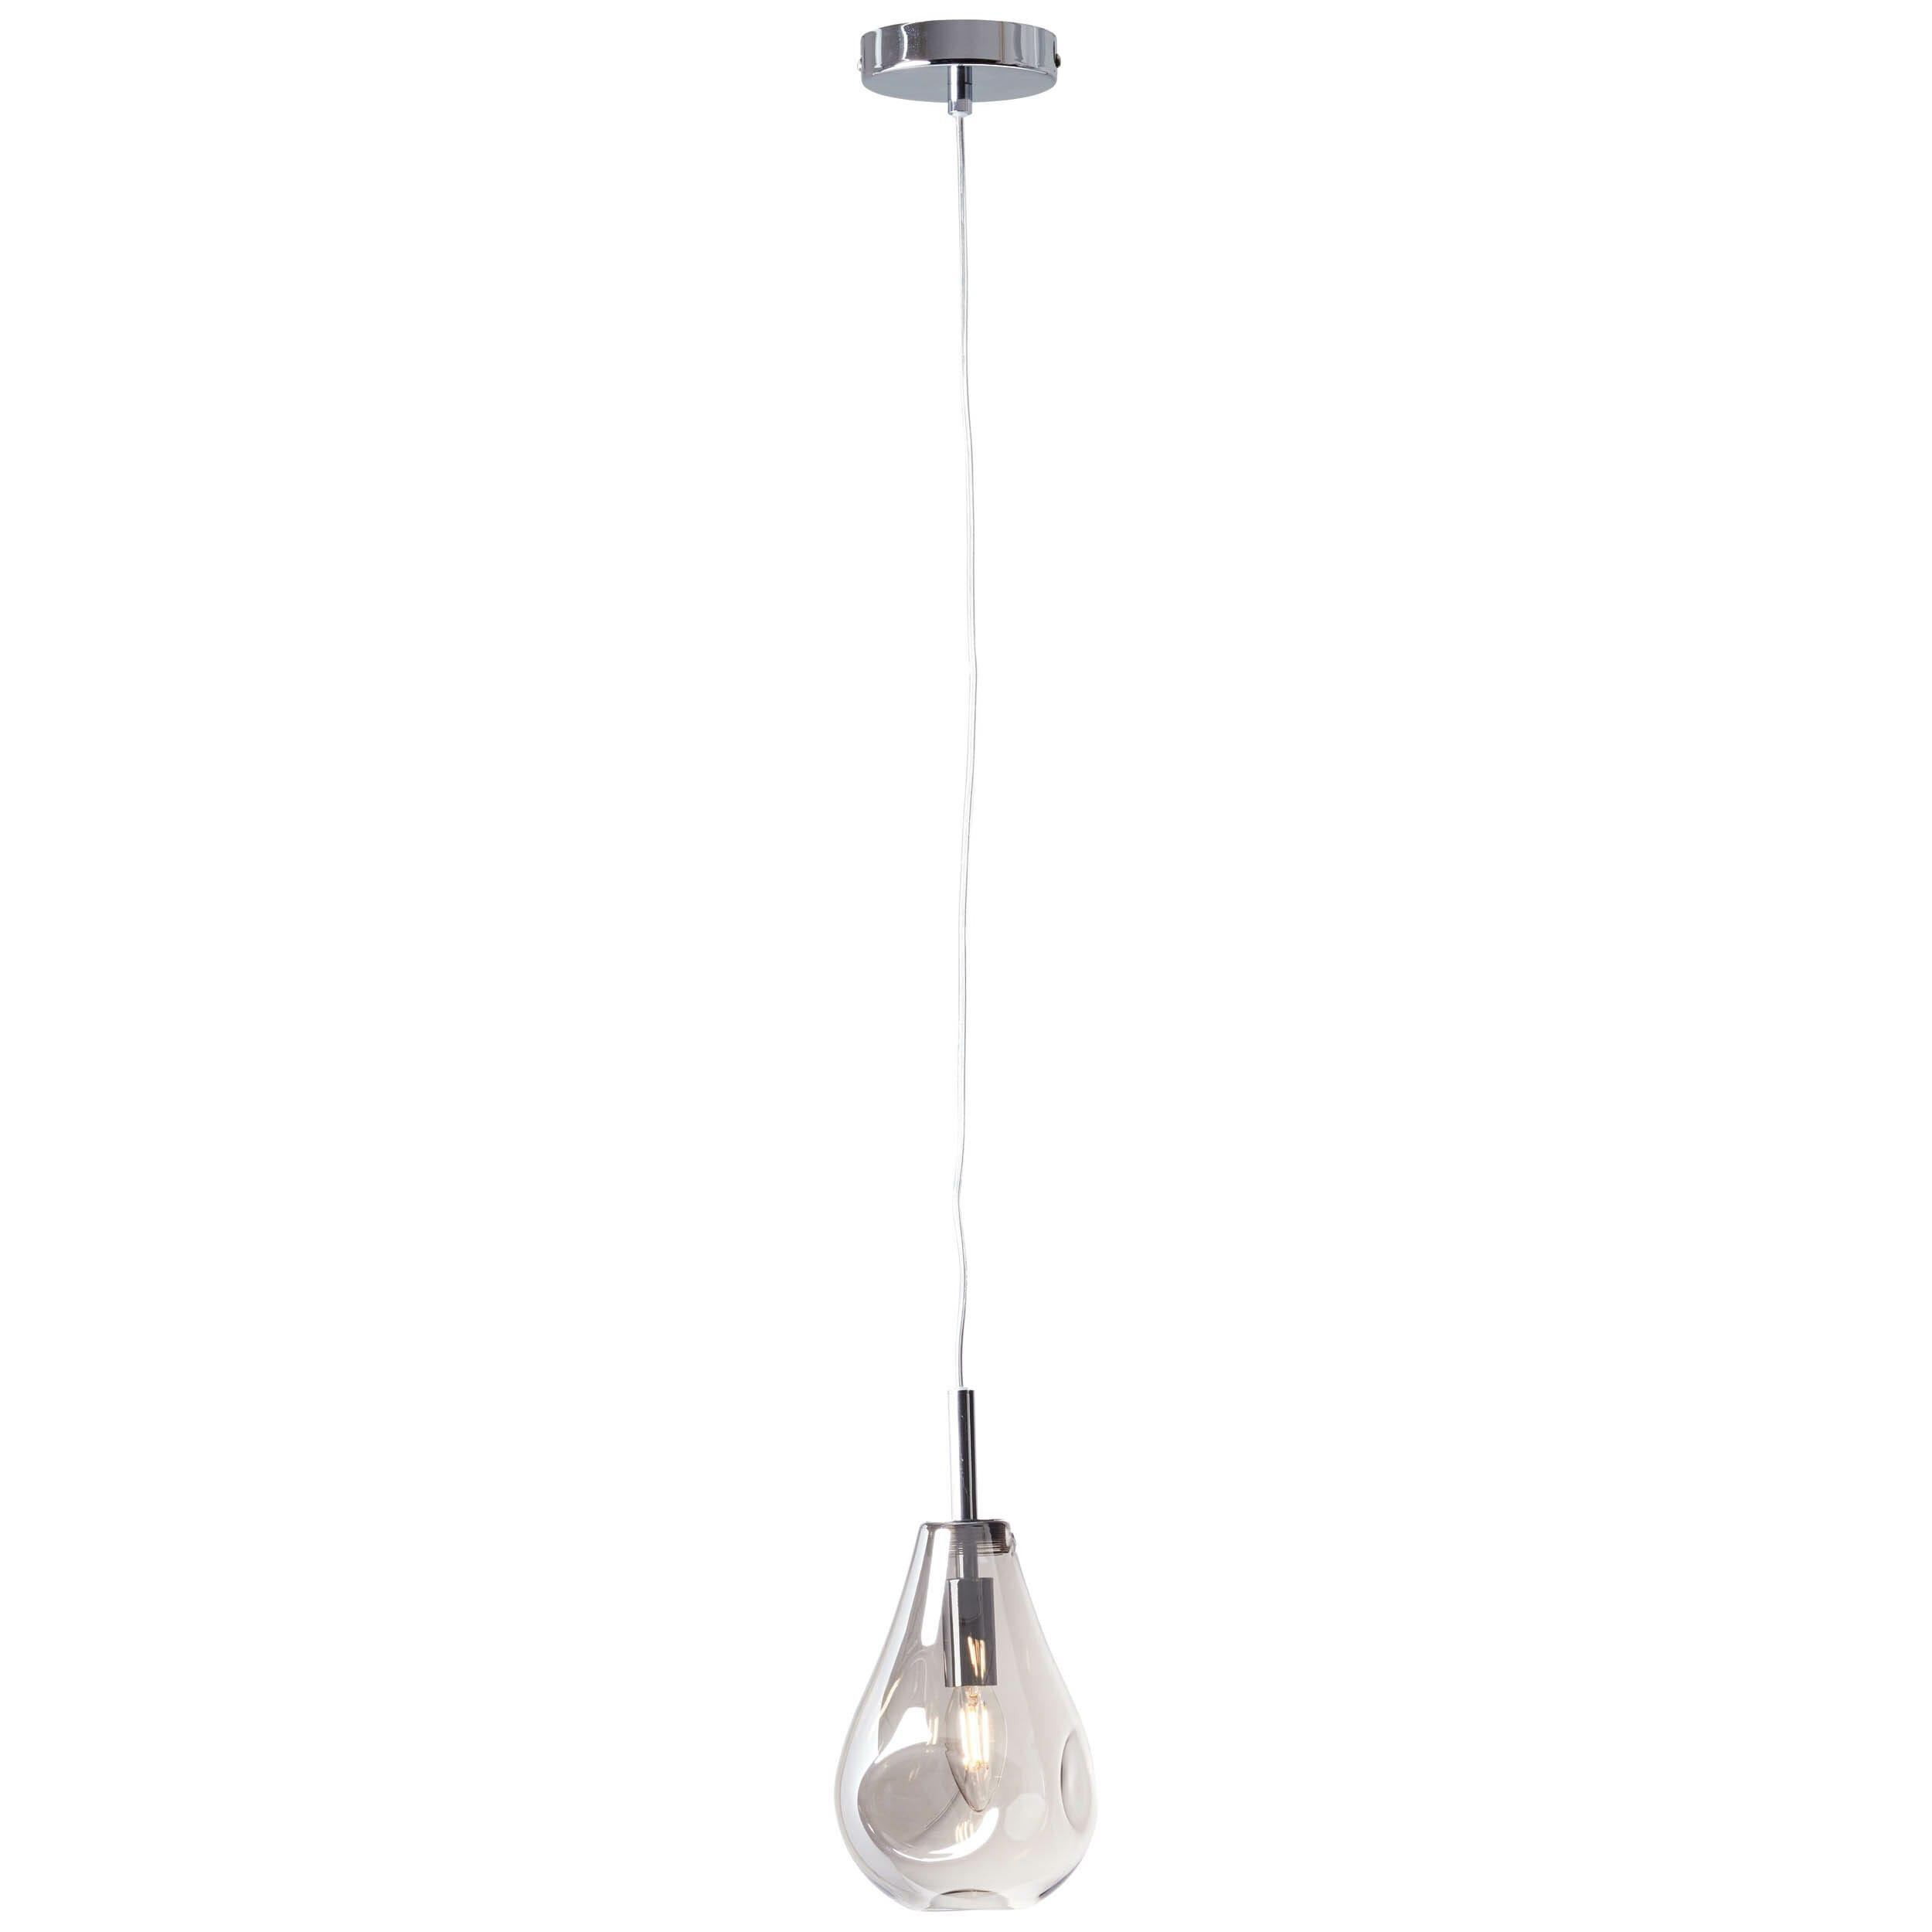 Brilliant Leuchten Deckenleuchten, E14, Drops Pendelleuchte 1flg rauchglas/chrom